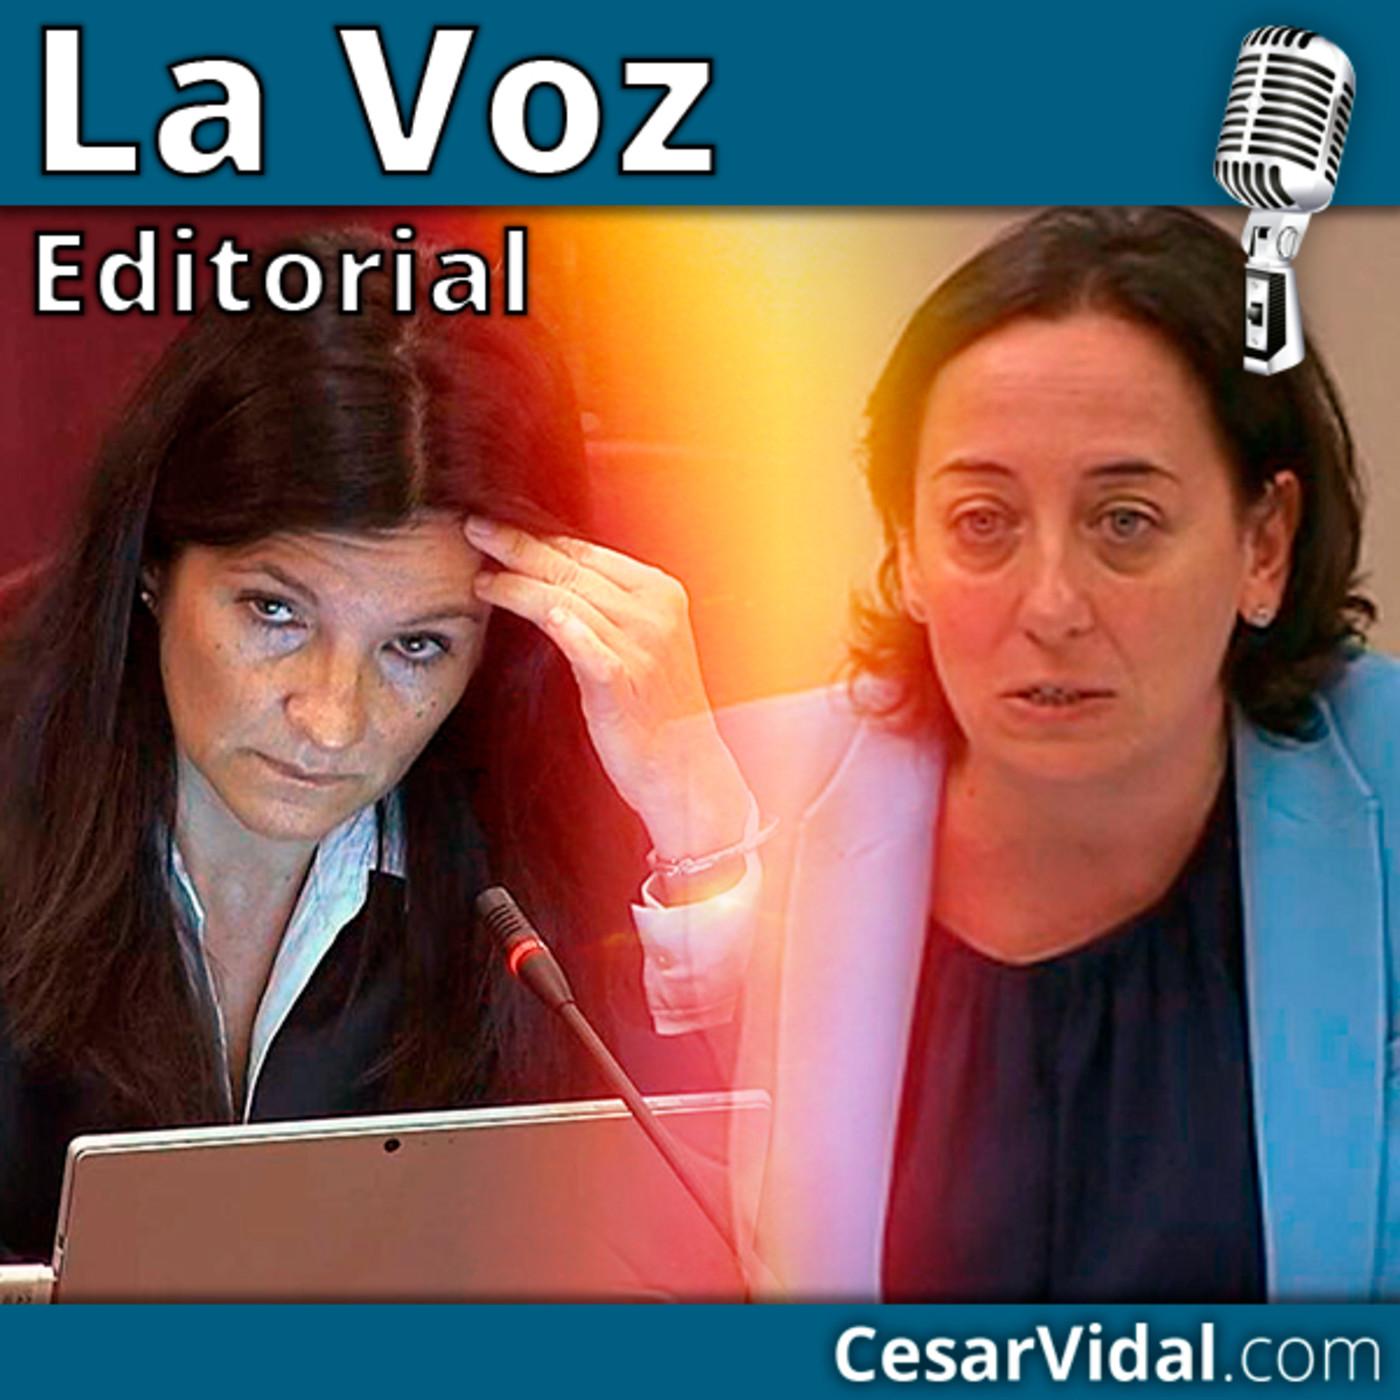 Editorial: Dos mujeres - 03/06/20